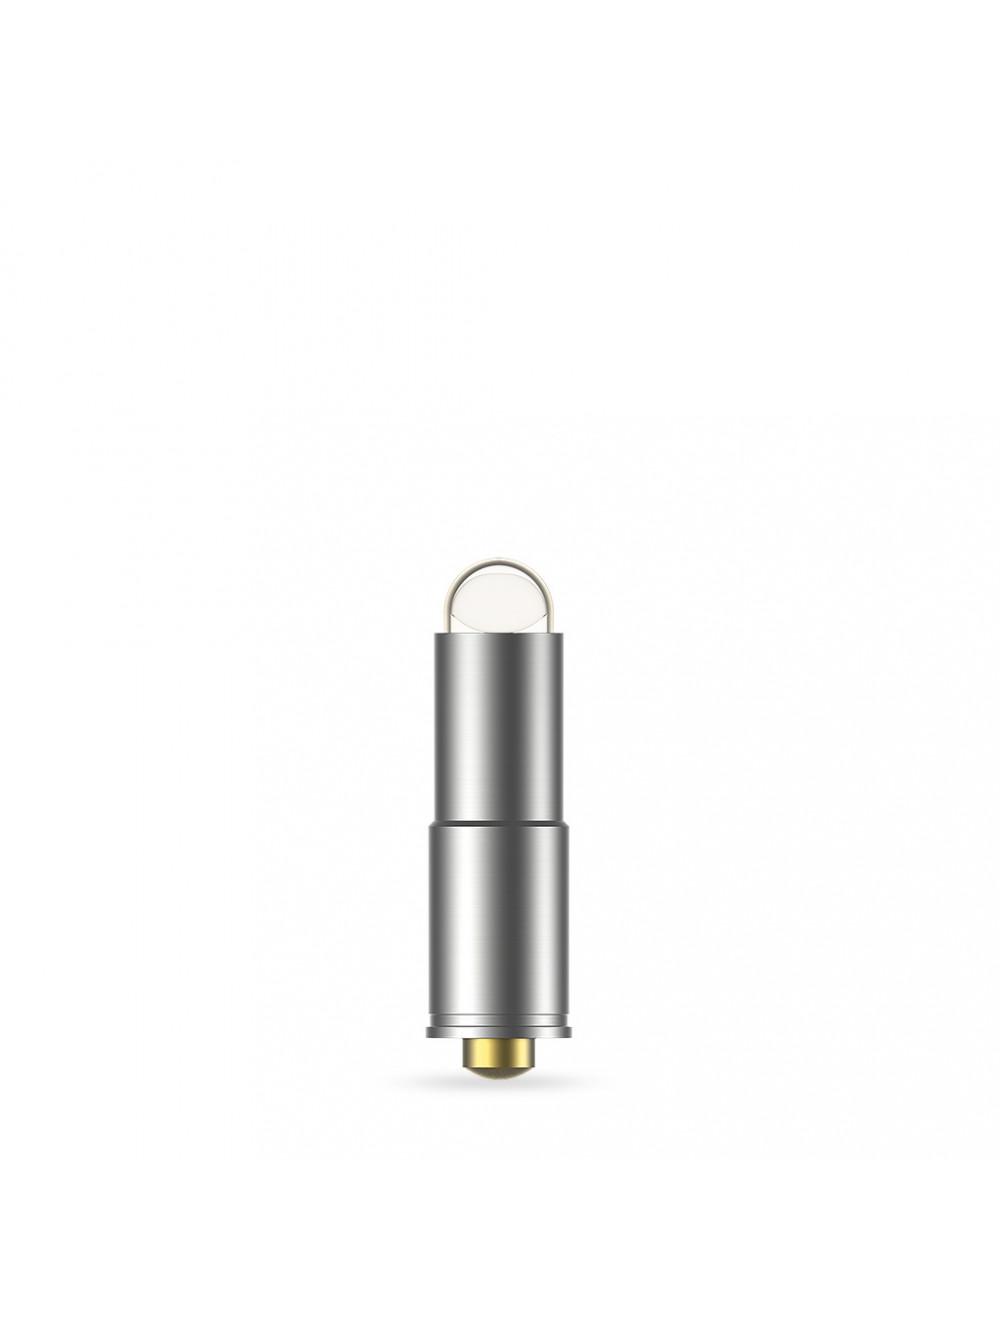 Das Produkt MK-dent Xenon Lampe BU7012WH aus dem Global-dent online shop.